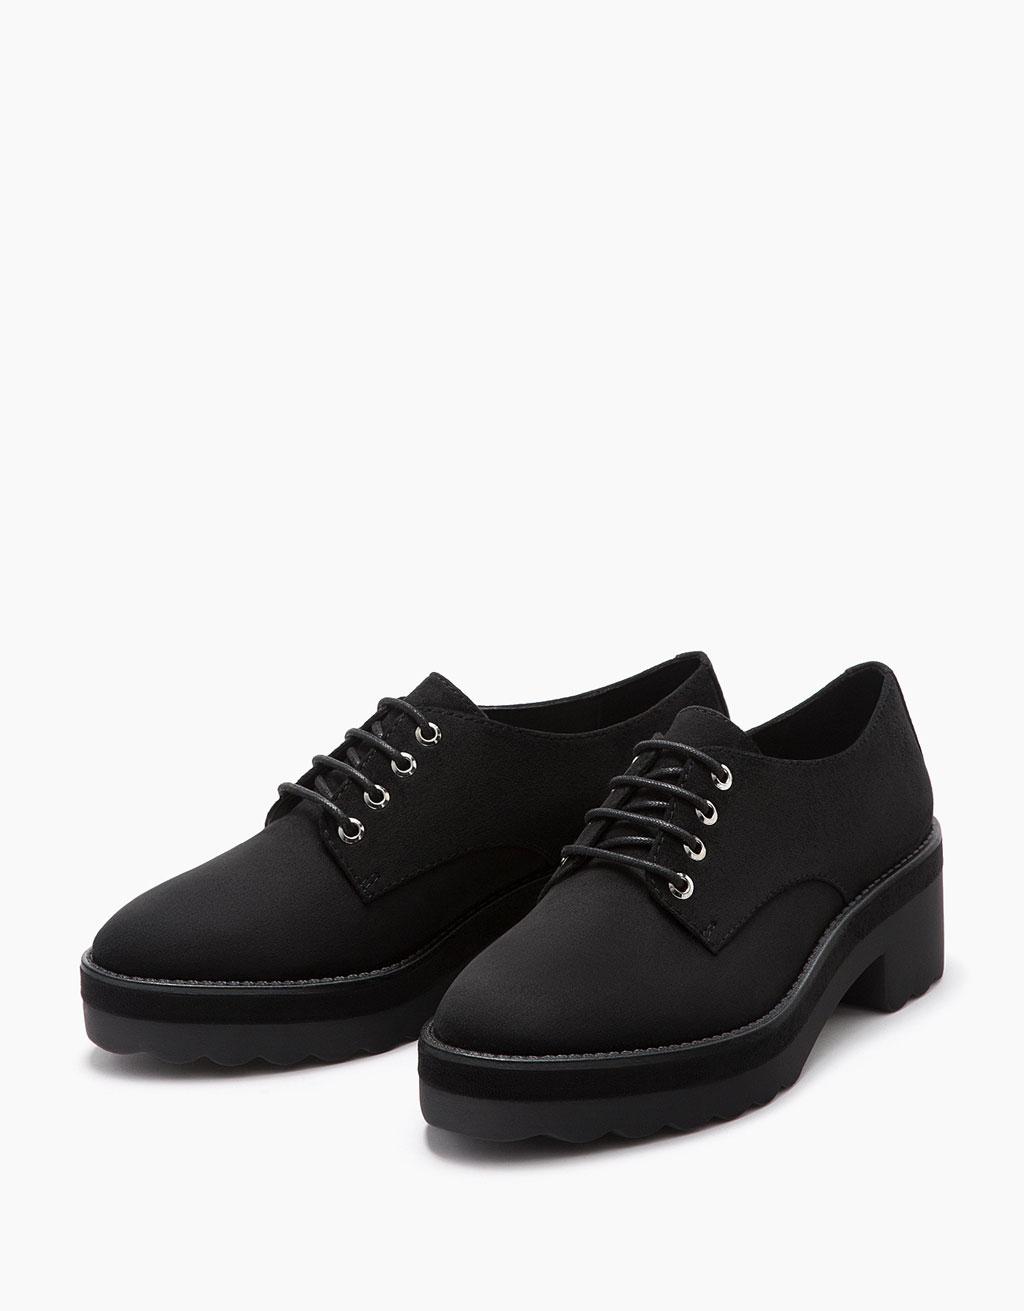 546c6018b6b197 chaussures bsk